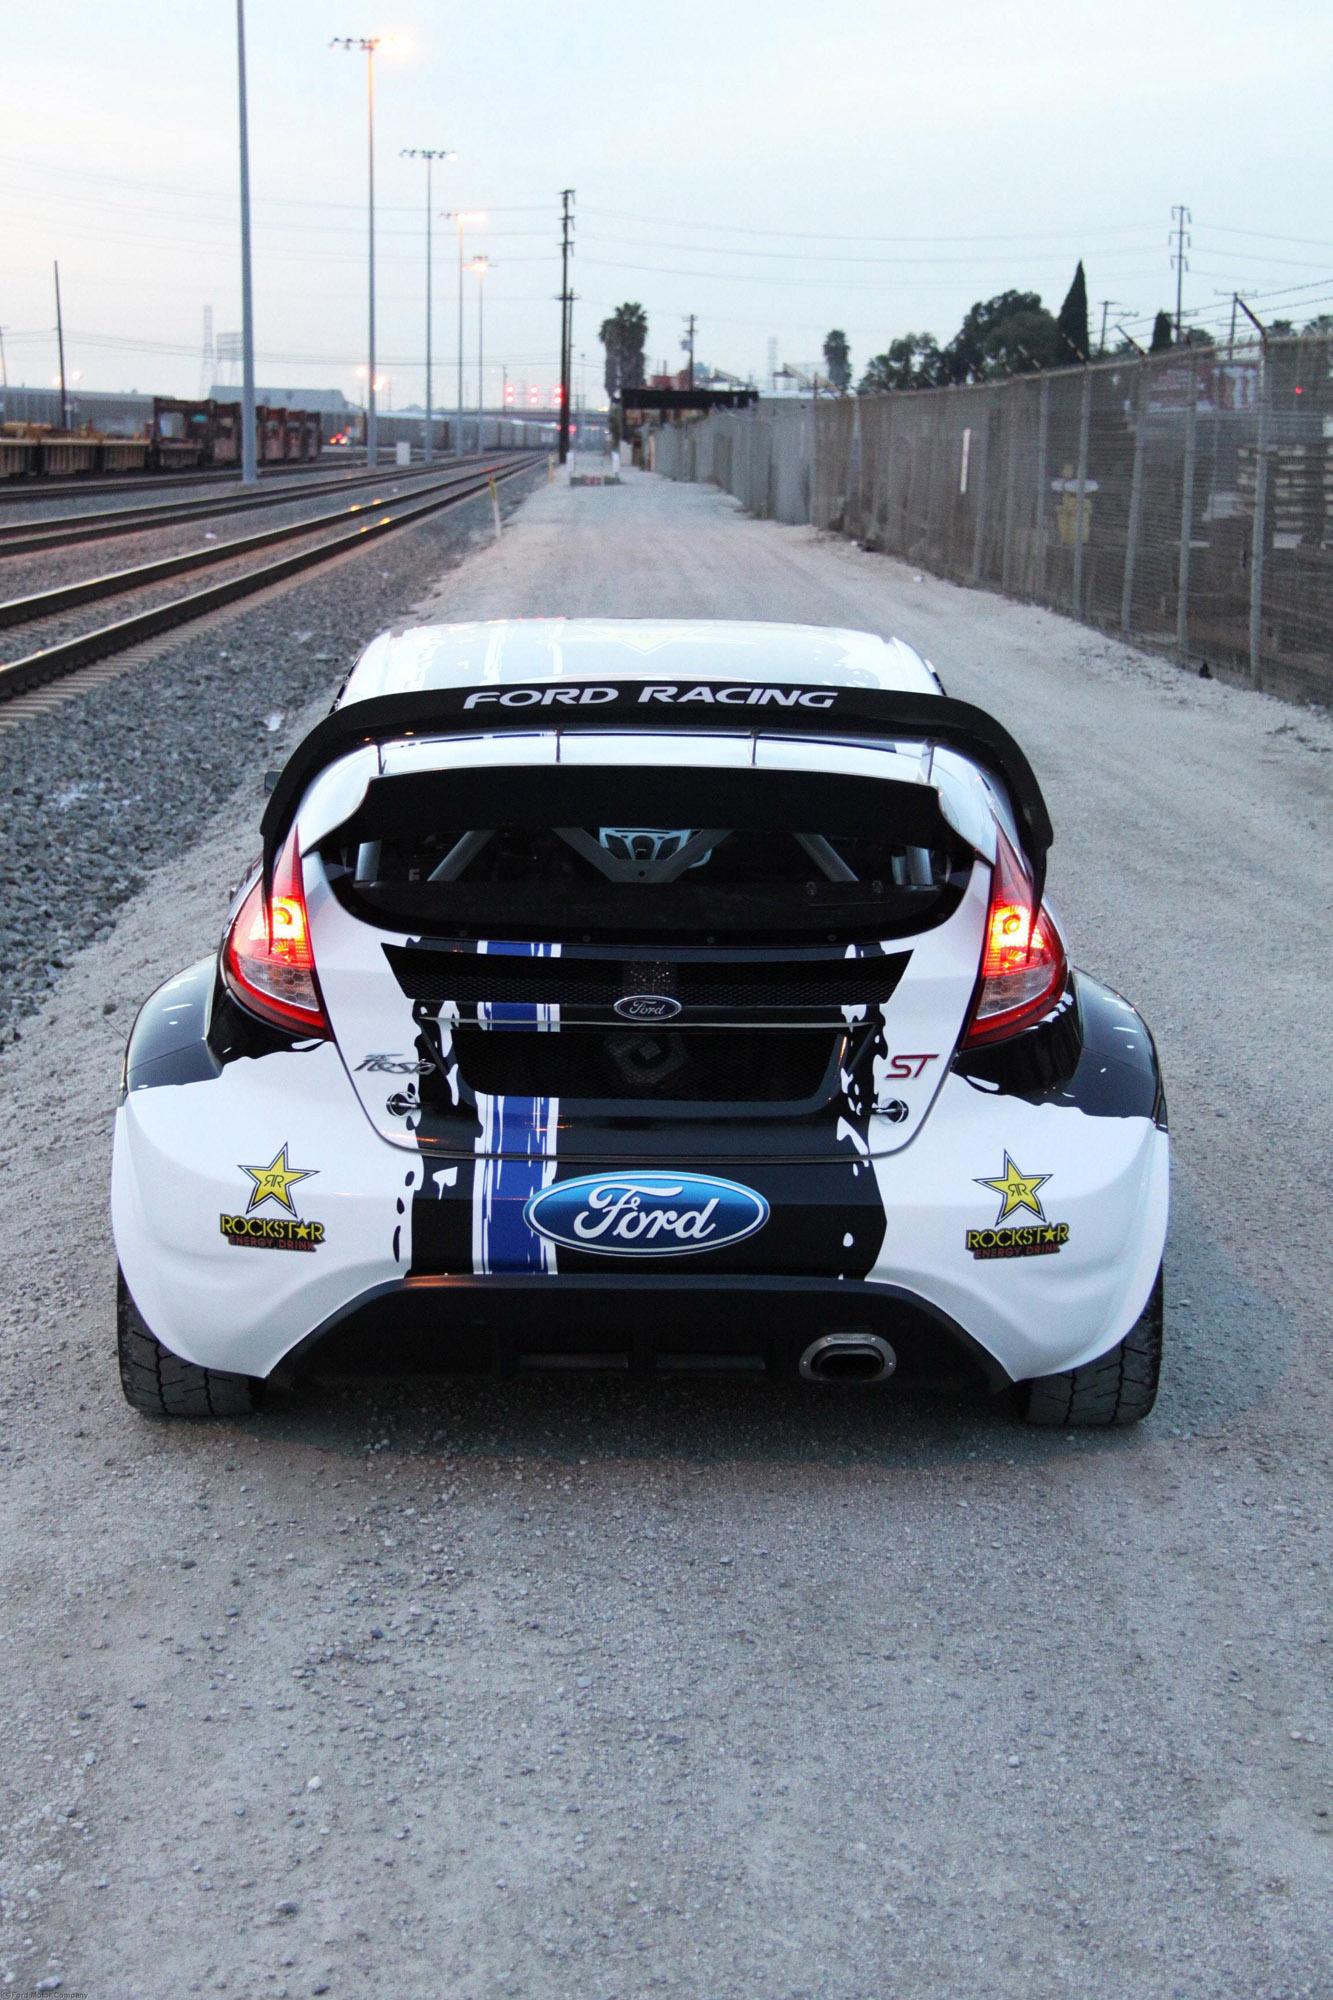 ford fiesta st global rallycross championship race car. Black Bedroom Furniture Sets. Home Design Ideas